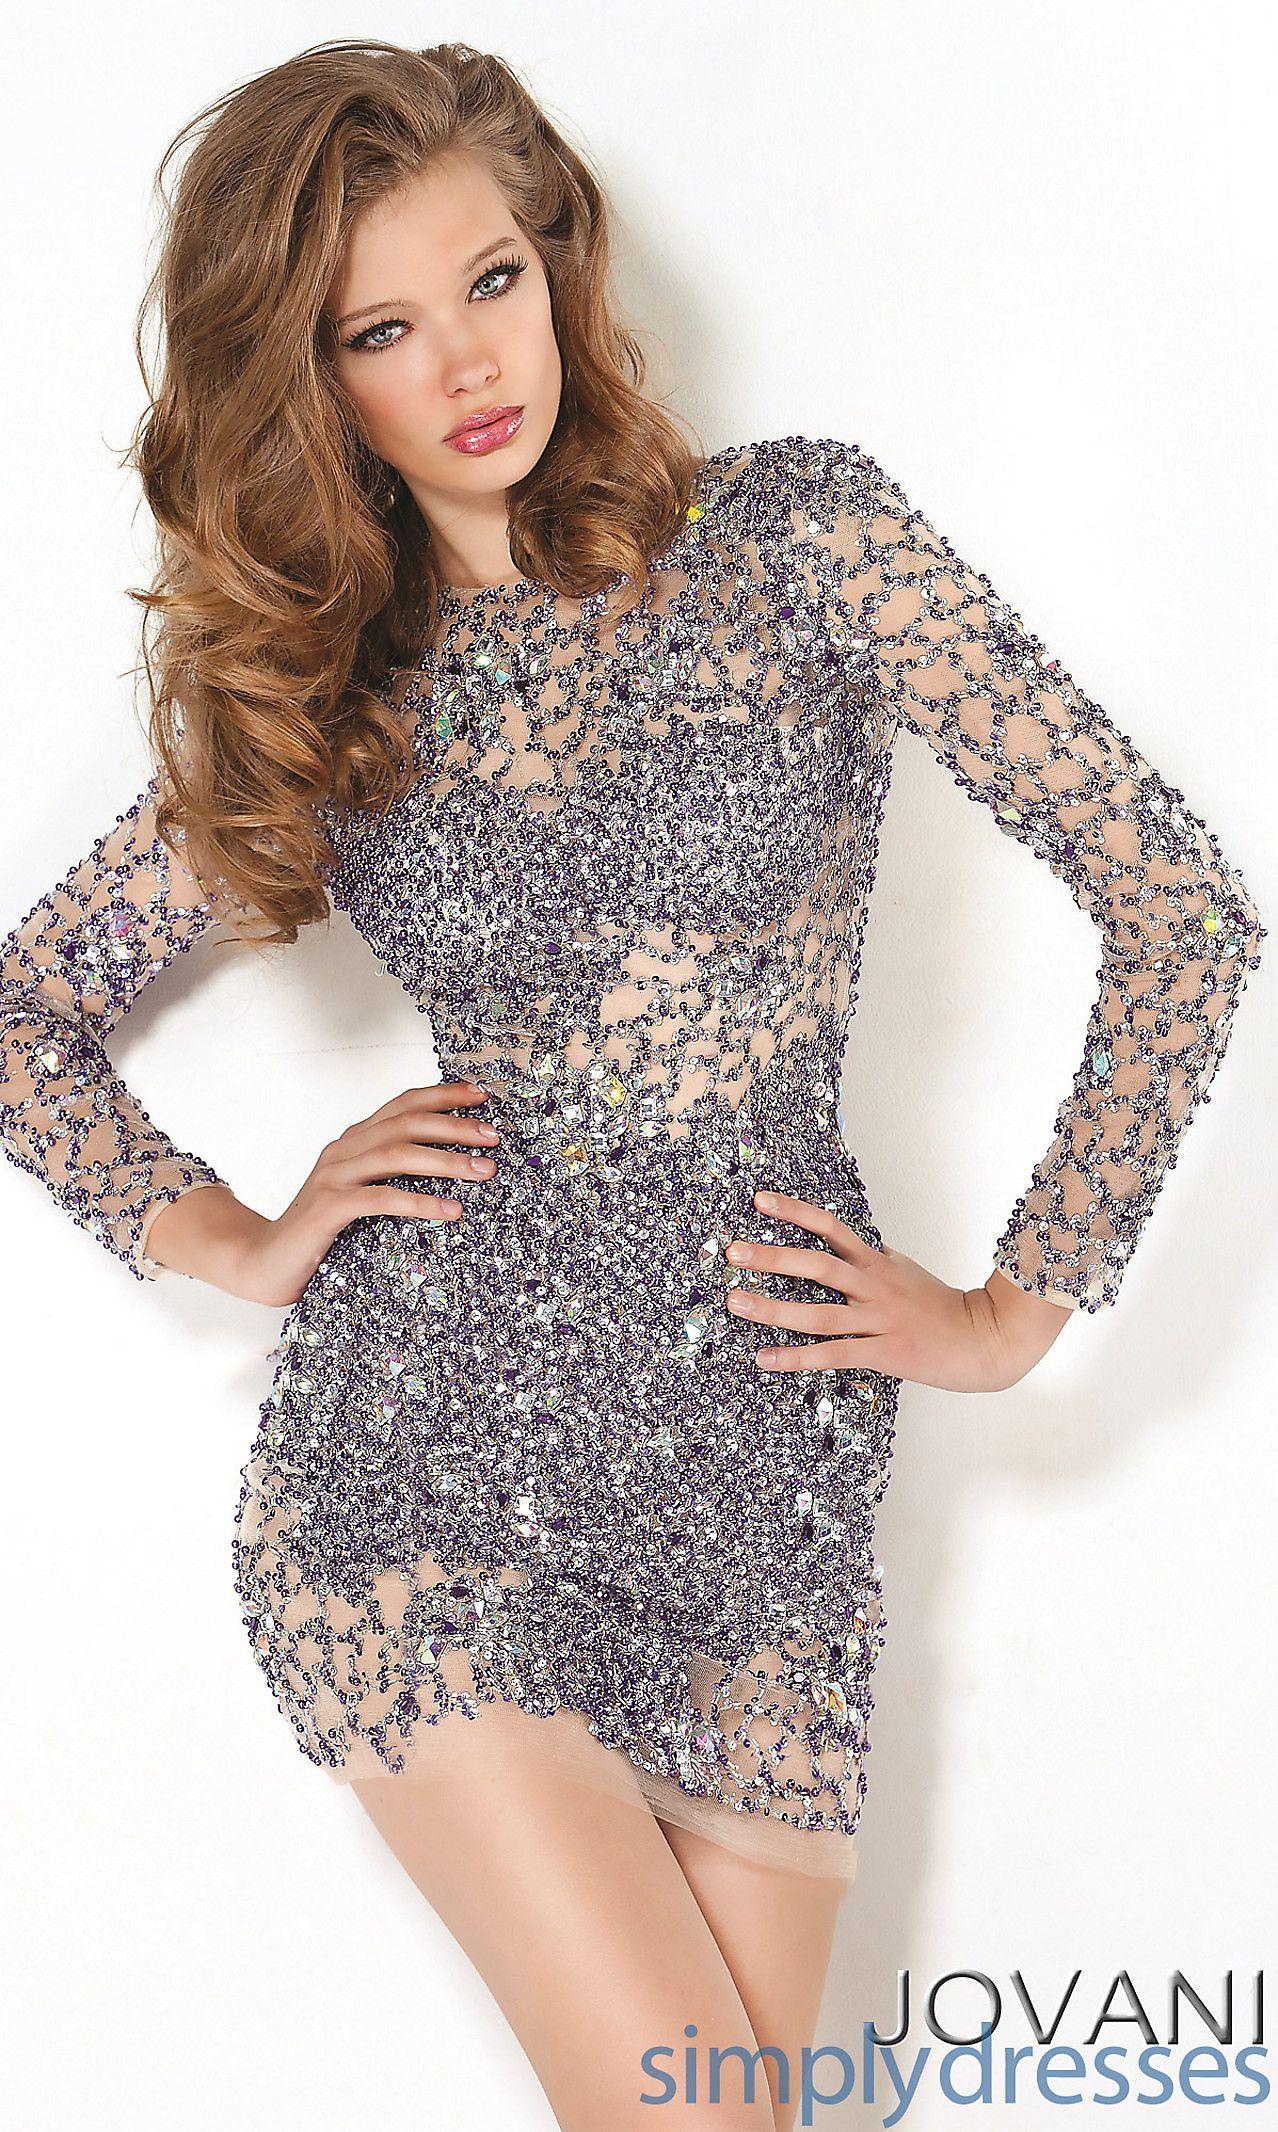 Short Sheer Dress